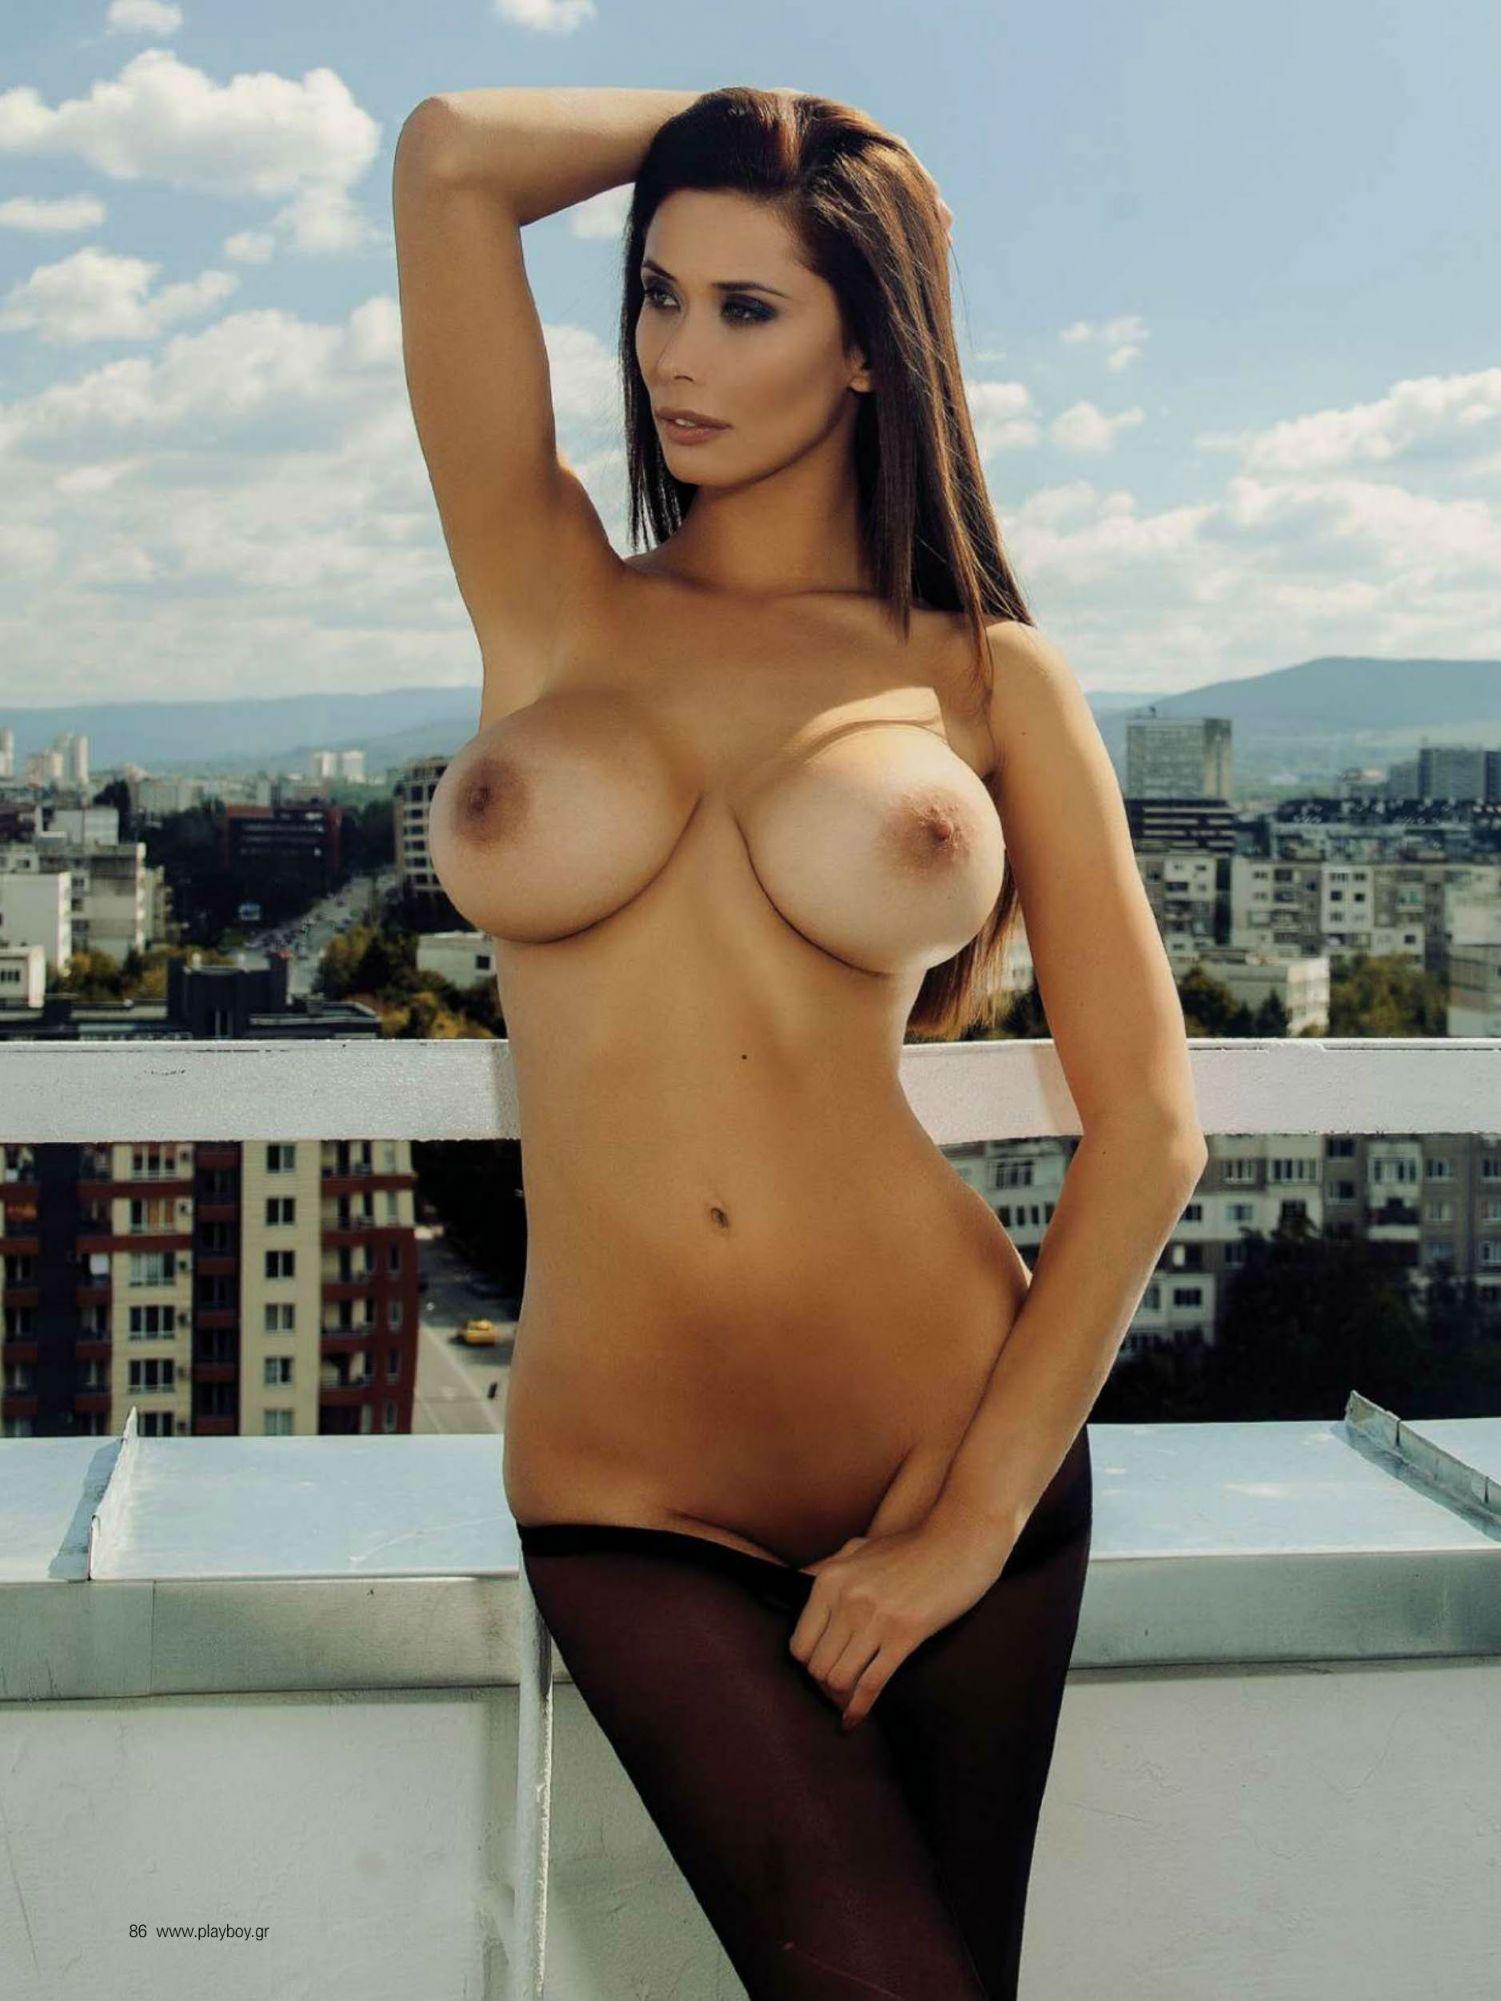 Bilyana Evgenieva pose nue pour le magazine Playboy grec